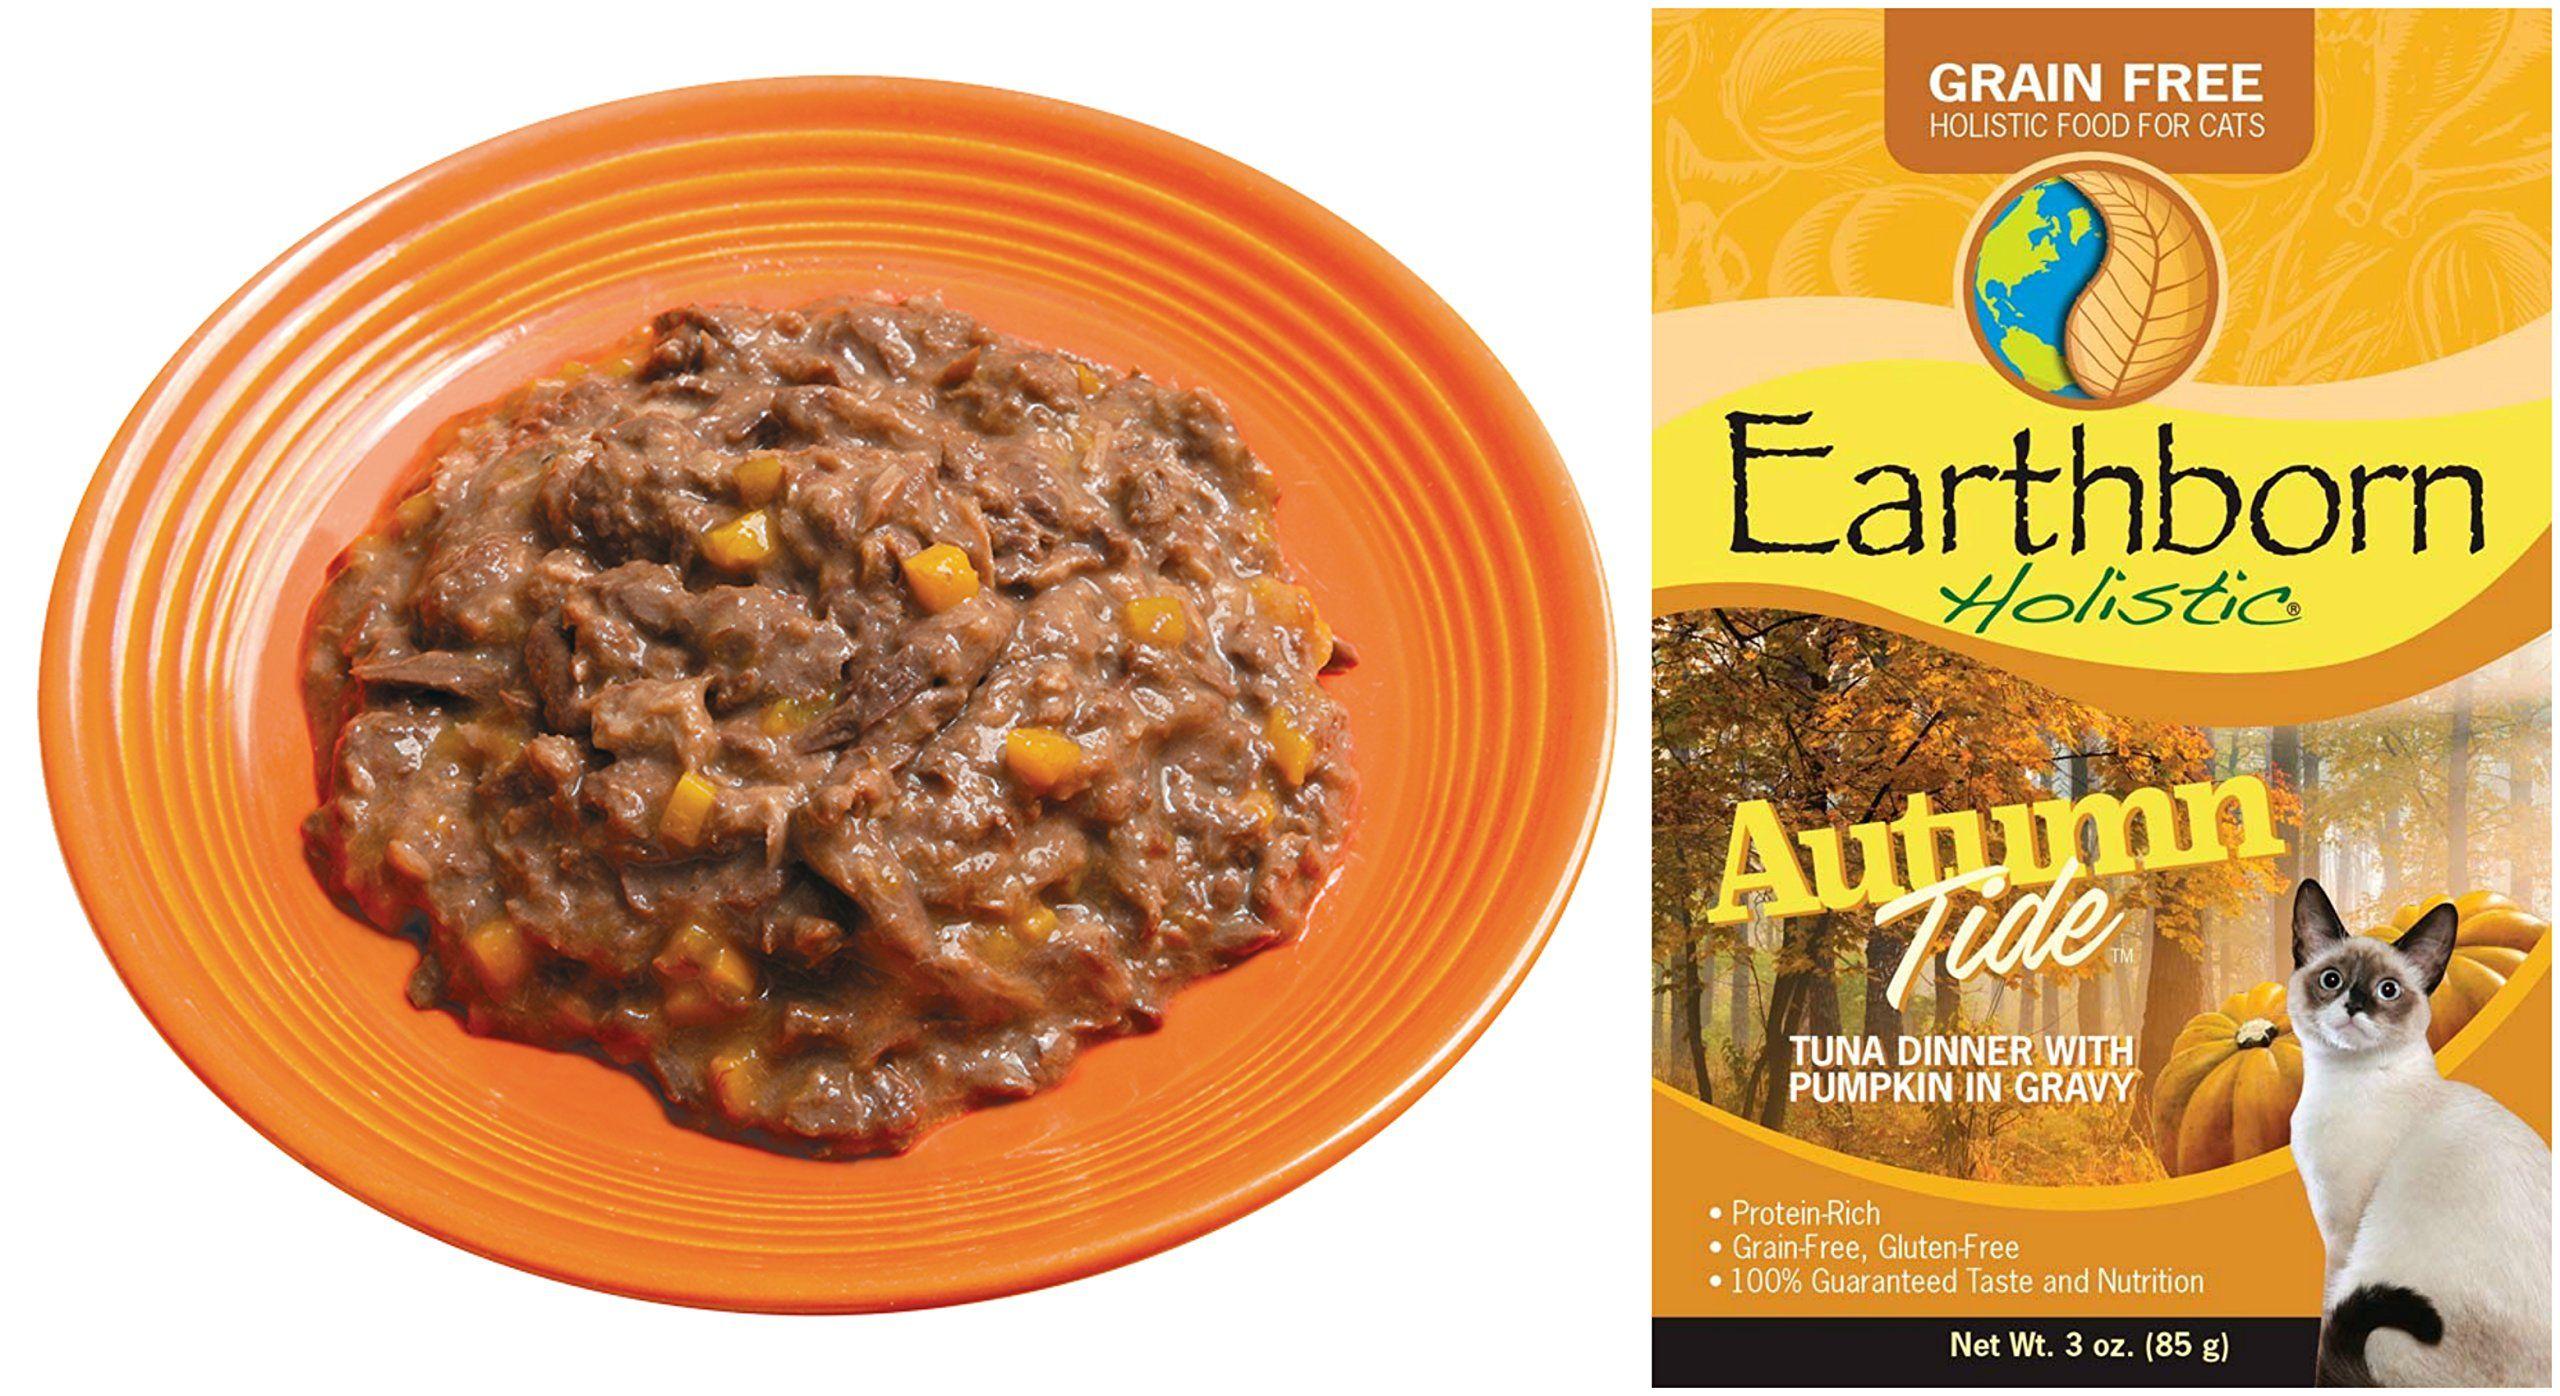 Earthborn holistic grain free cat food in gravy in 6